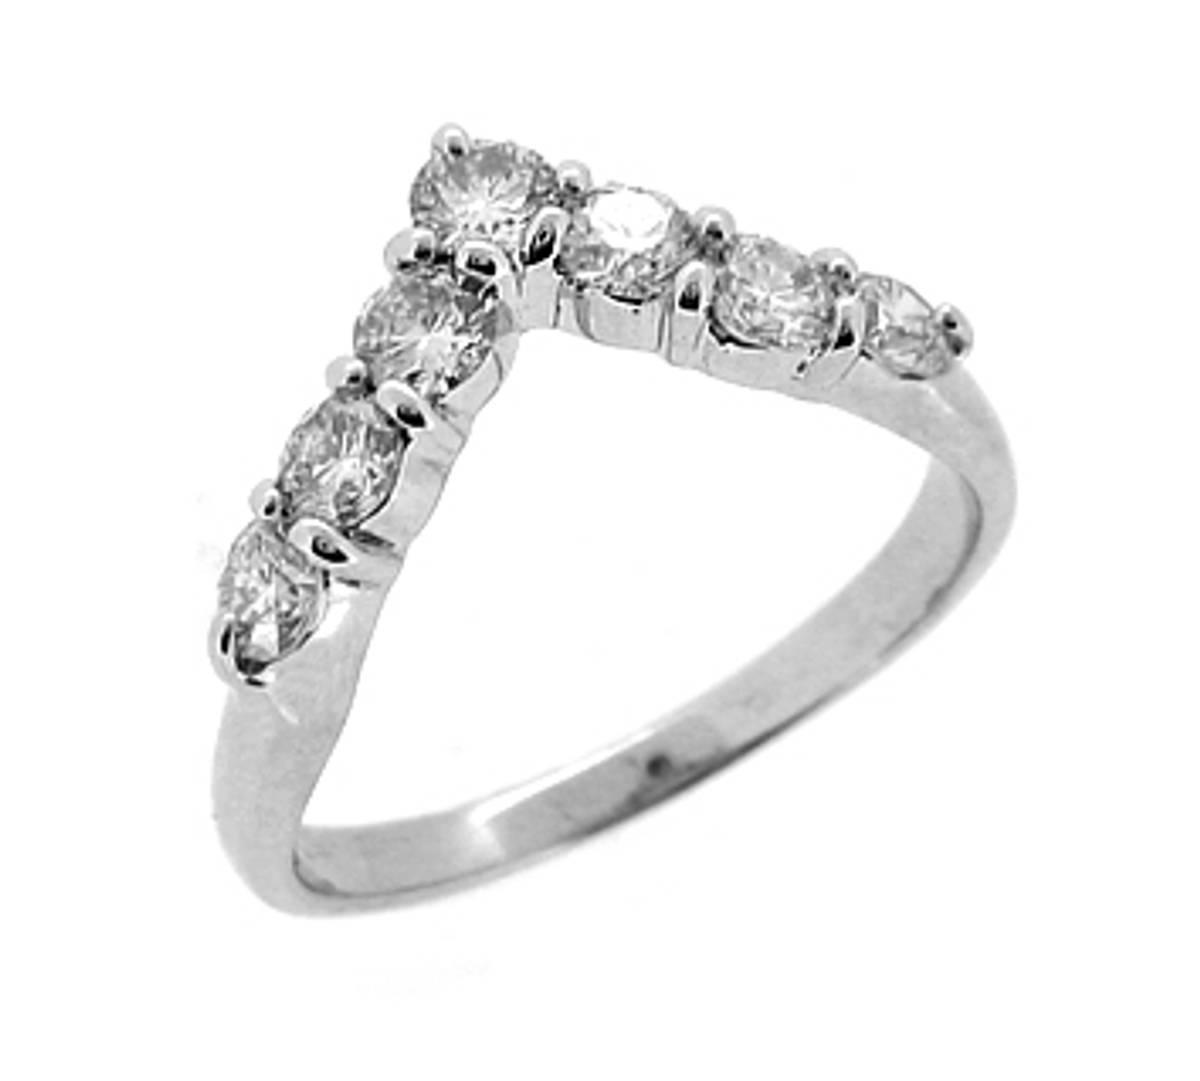 18k white gold 7st brilliant cut diamond wishbone ring Carat: total diamond weight 0.84cts Metal: 18k white gold